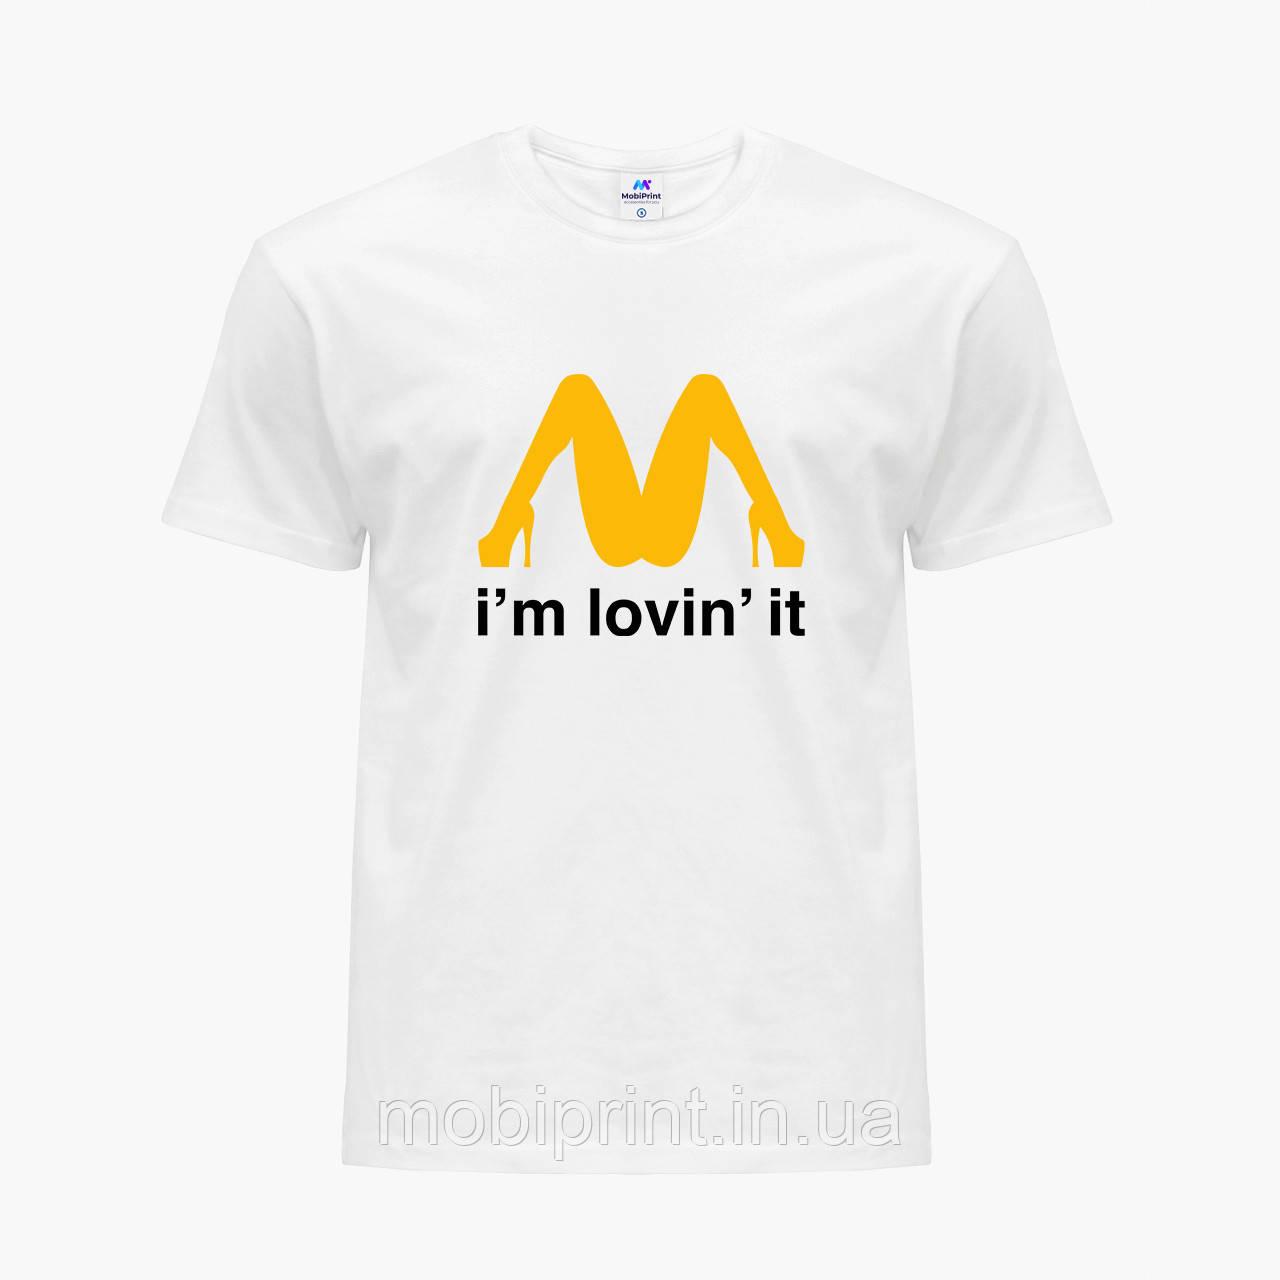 Футболка мужская Я это люблю (I'm lovin' it) Белый (9223-2013)